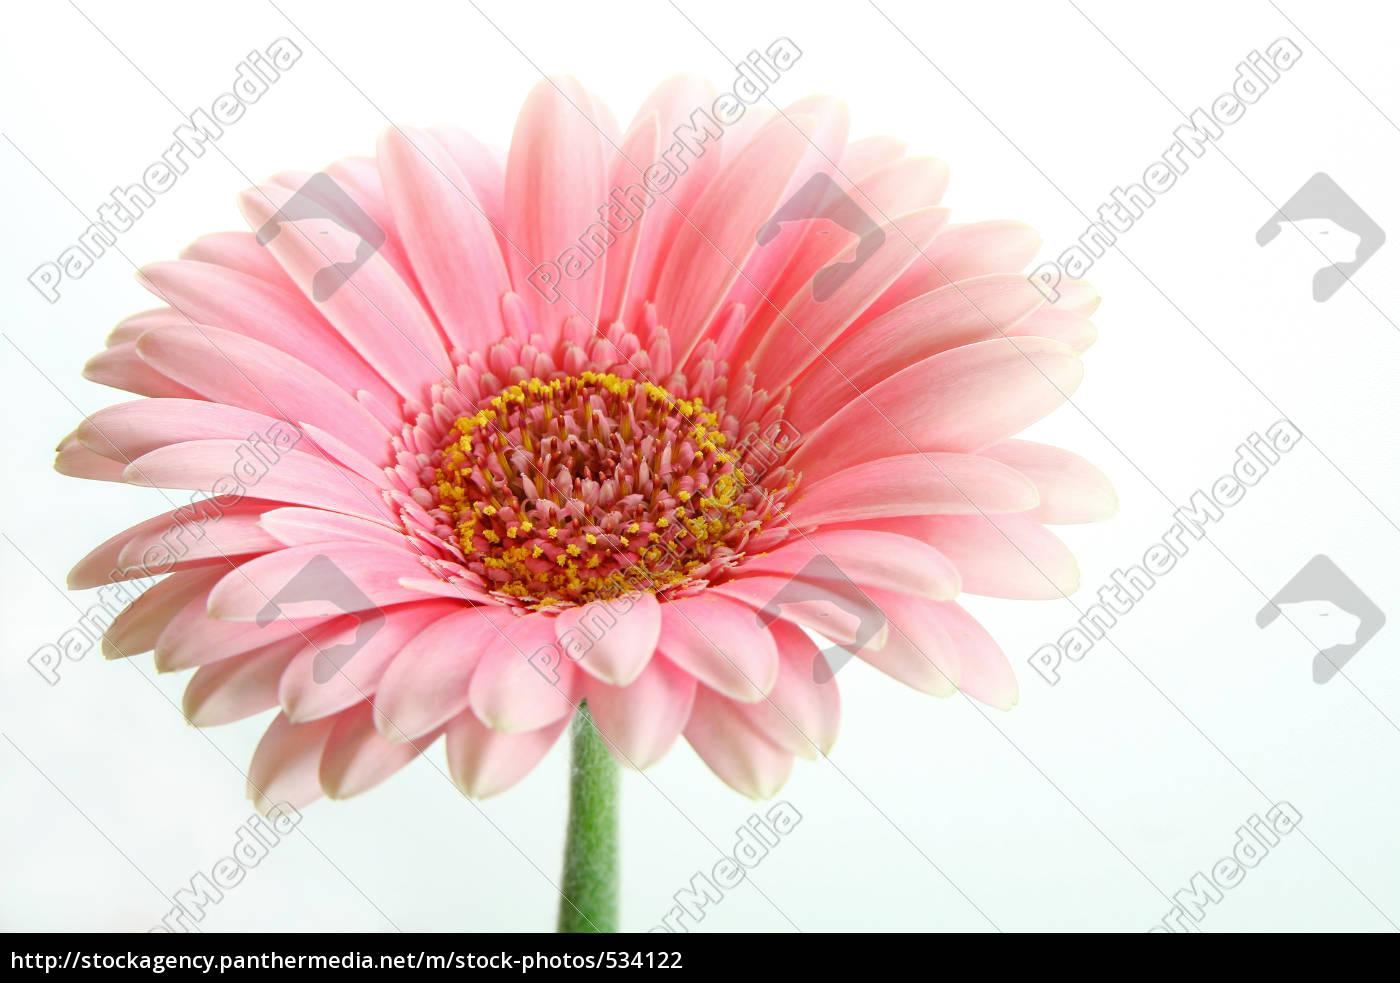 blooms - 534122